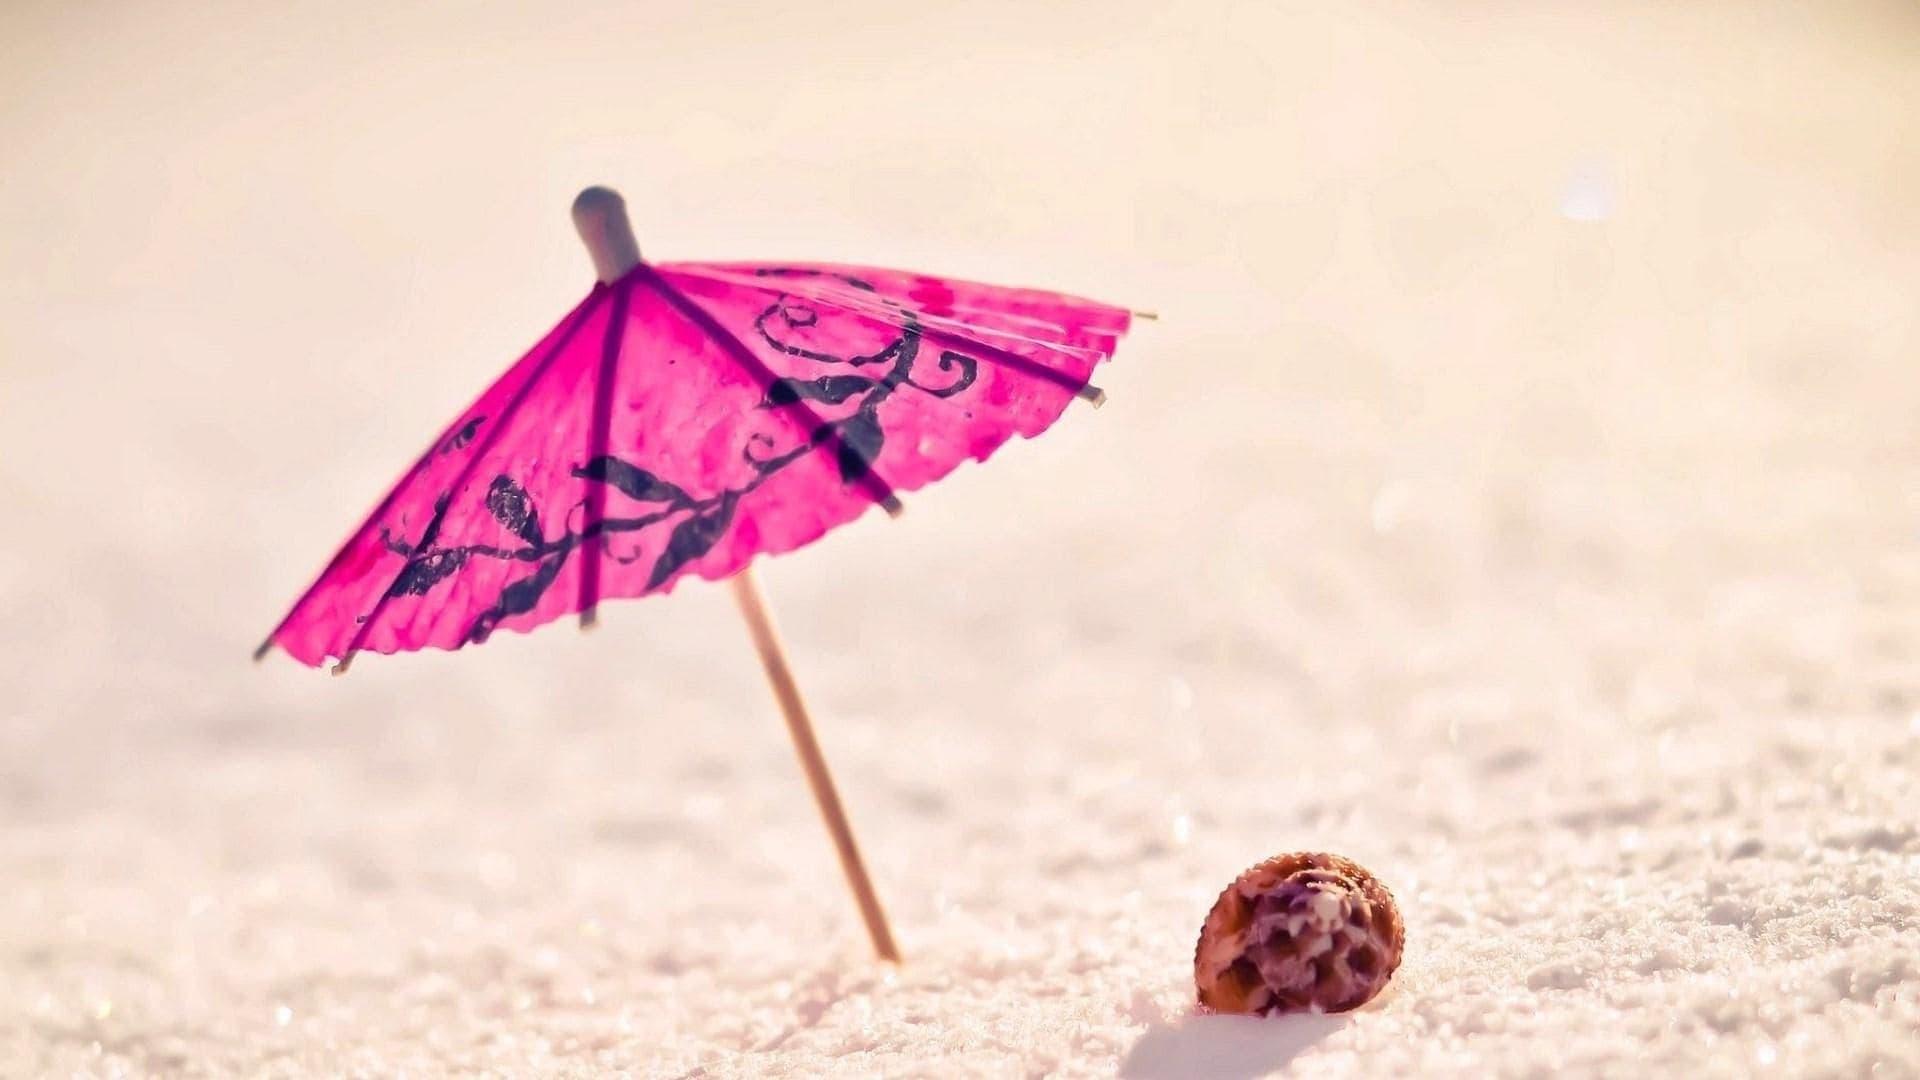 umbrella dream meaning, dream about umbrella, umbrella dream interpretation, seeing in a dream umbrella